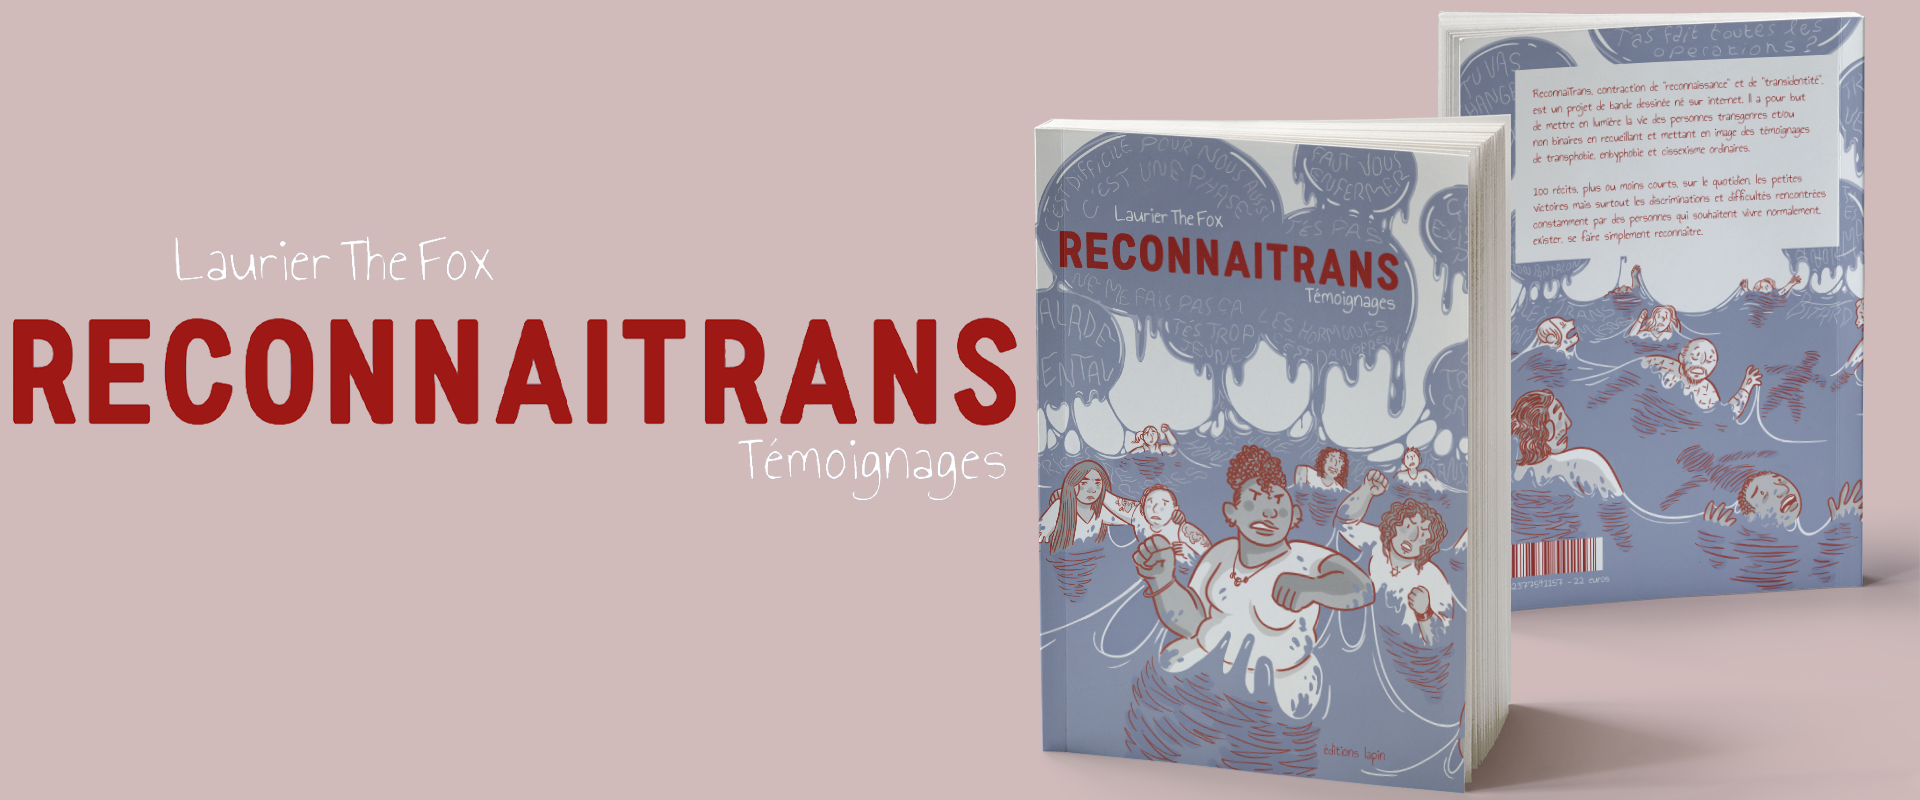 Reconnaitrans